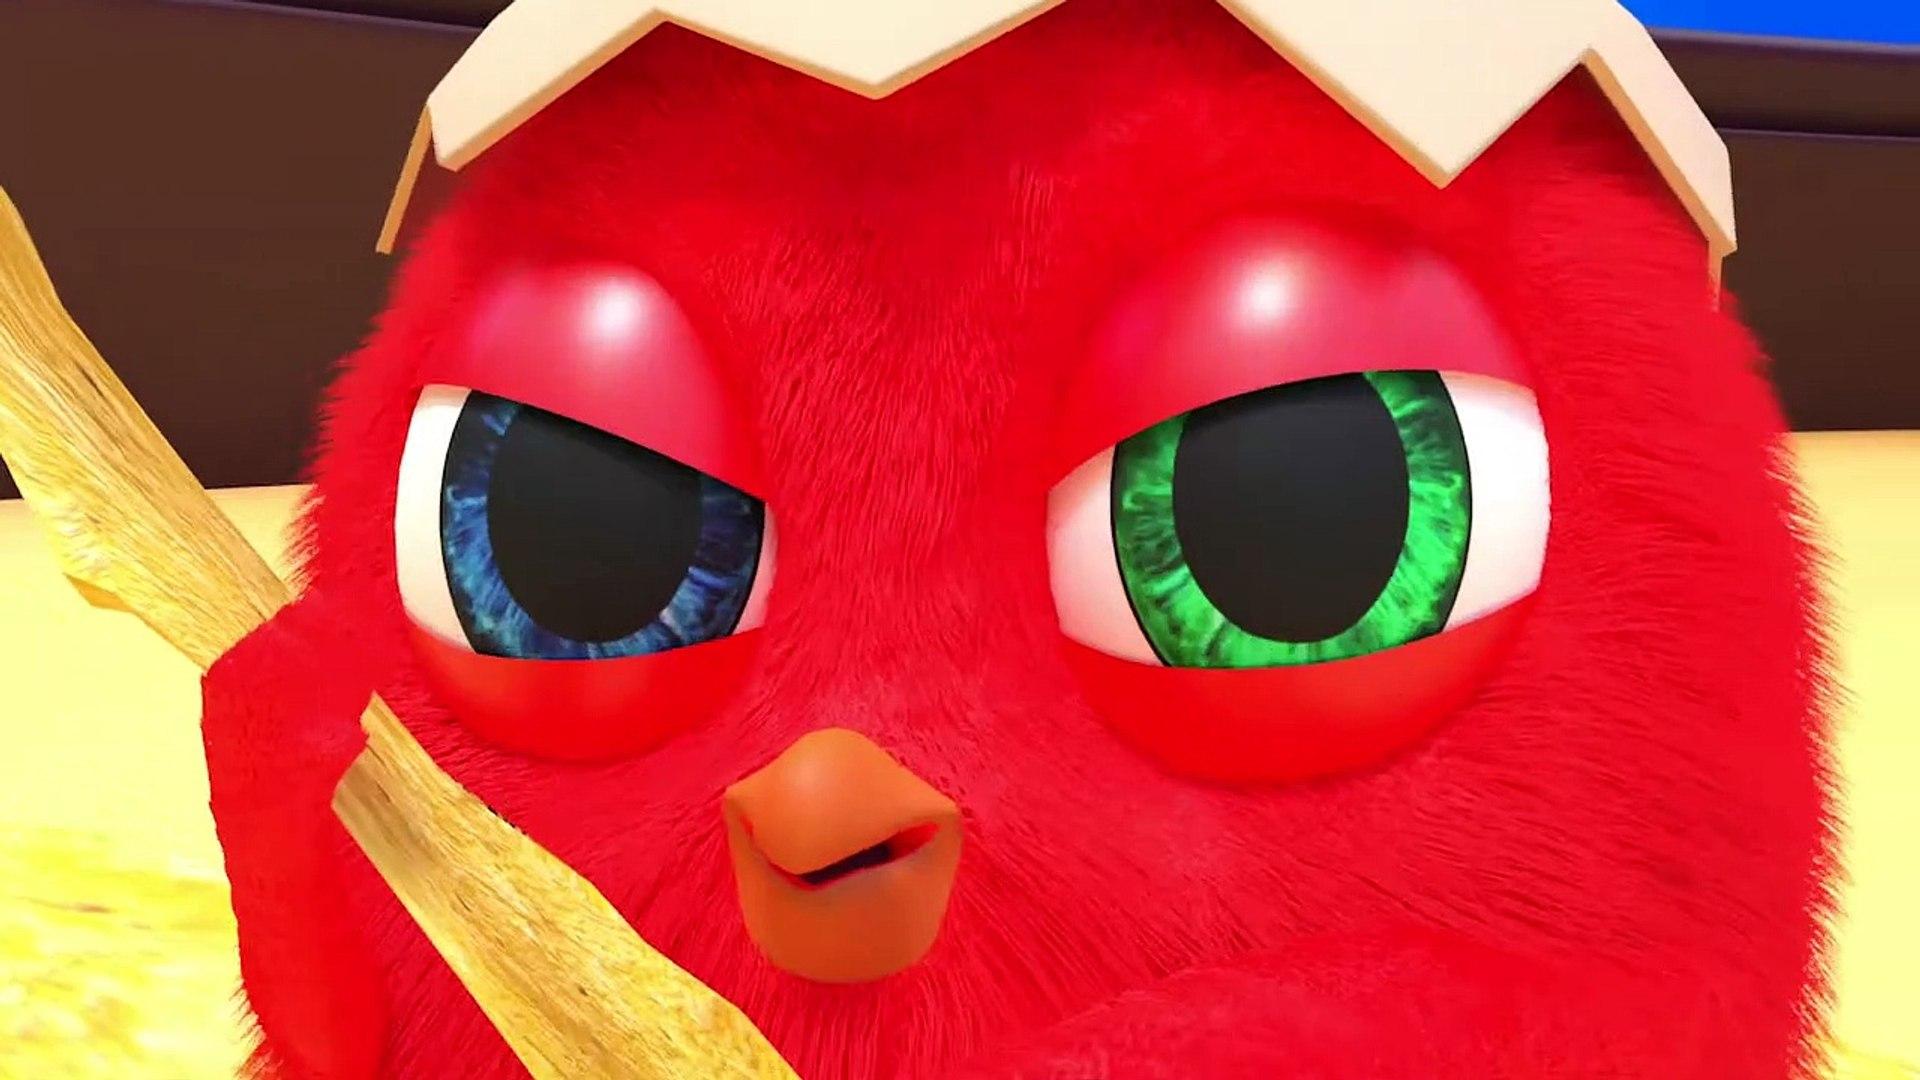 CucKoo Cartoon  Cuckoo Chicken 2020 - Part 5 Drôle de bande dessinée pour les enfants 2020